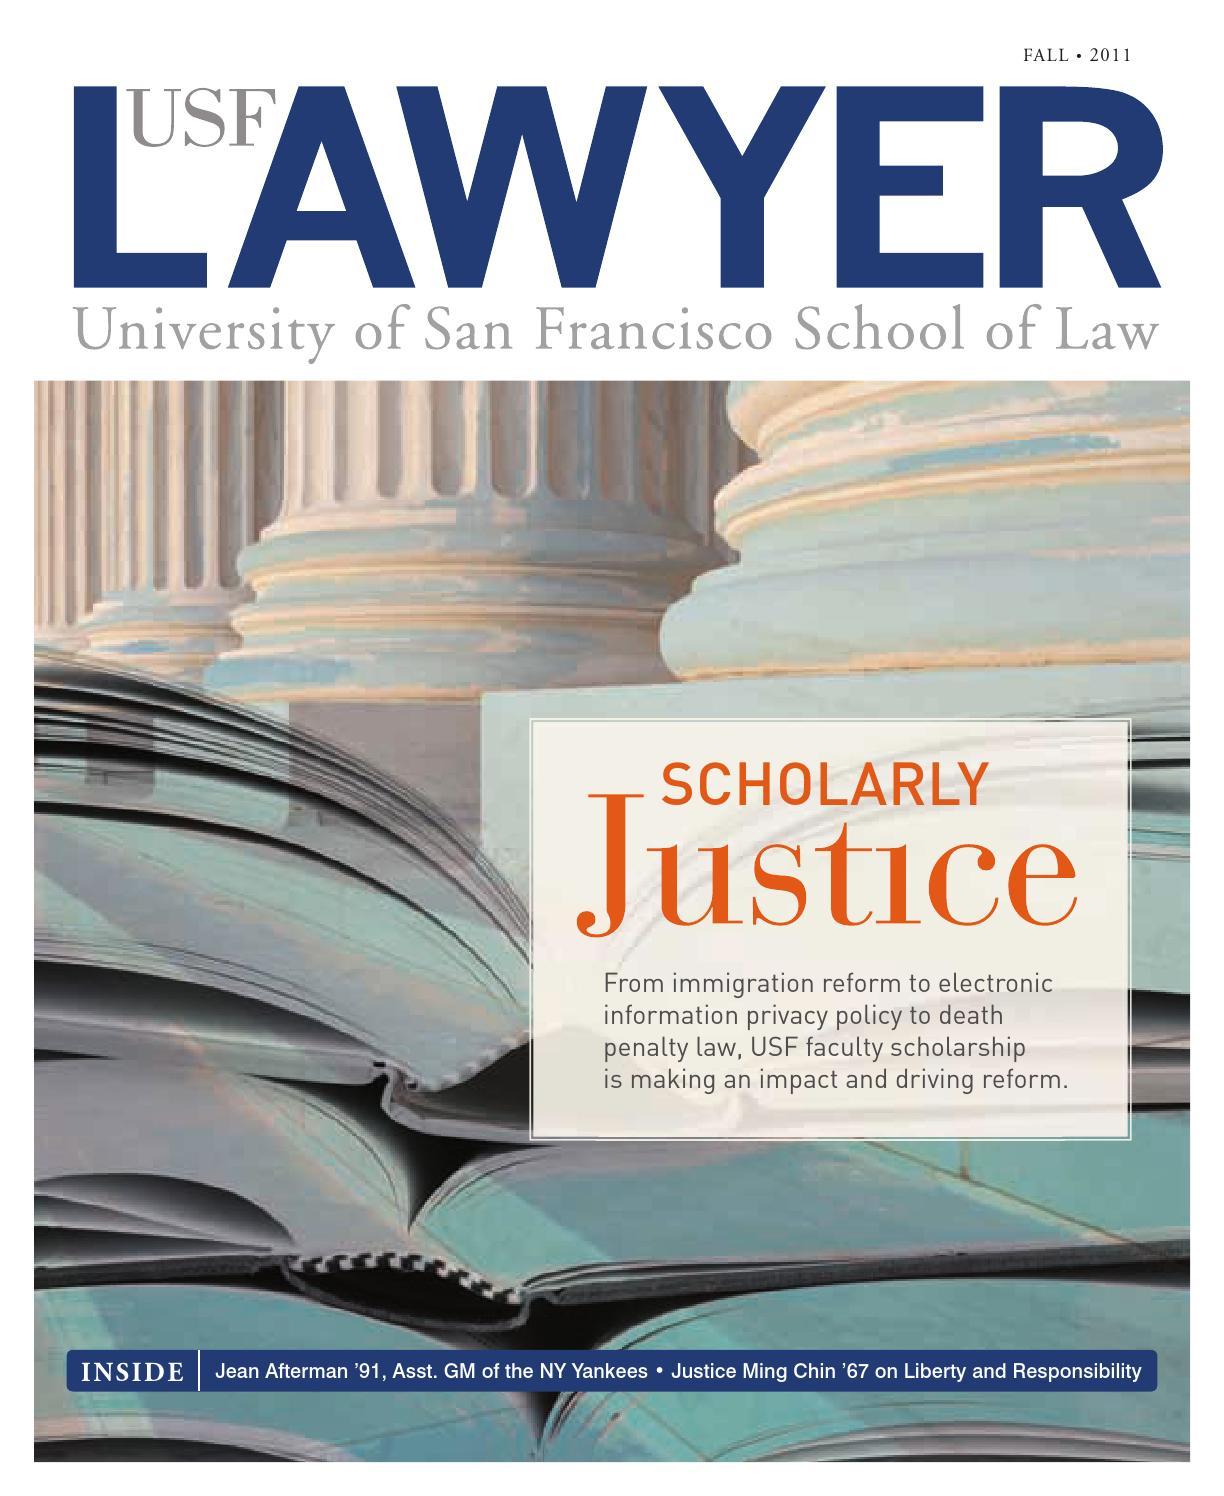 usf lawyer fall 2014 by usf school of law